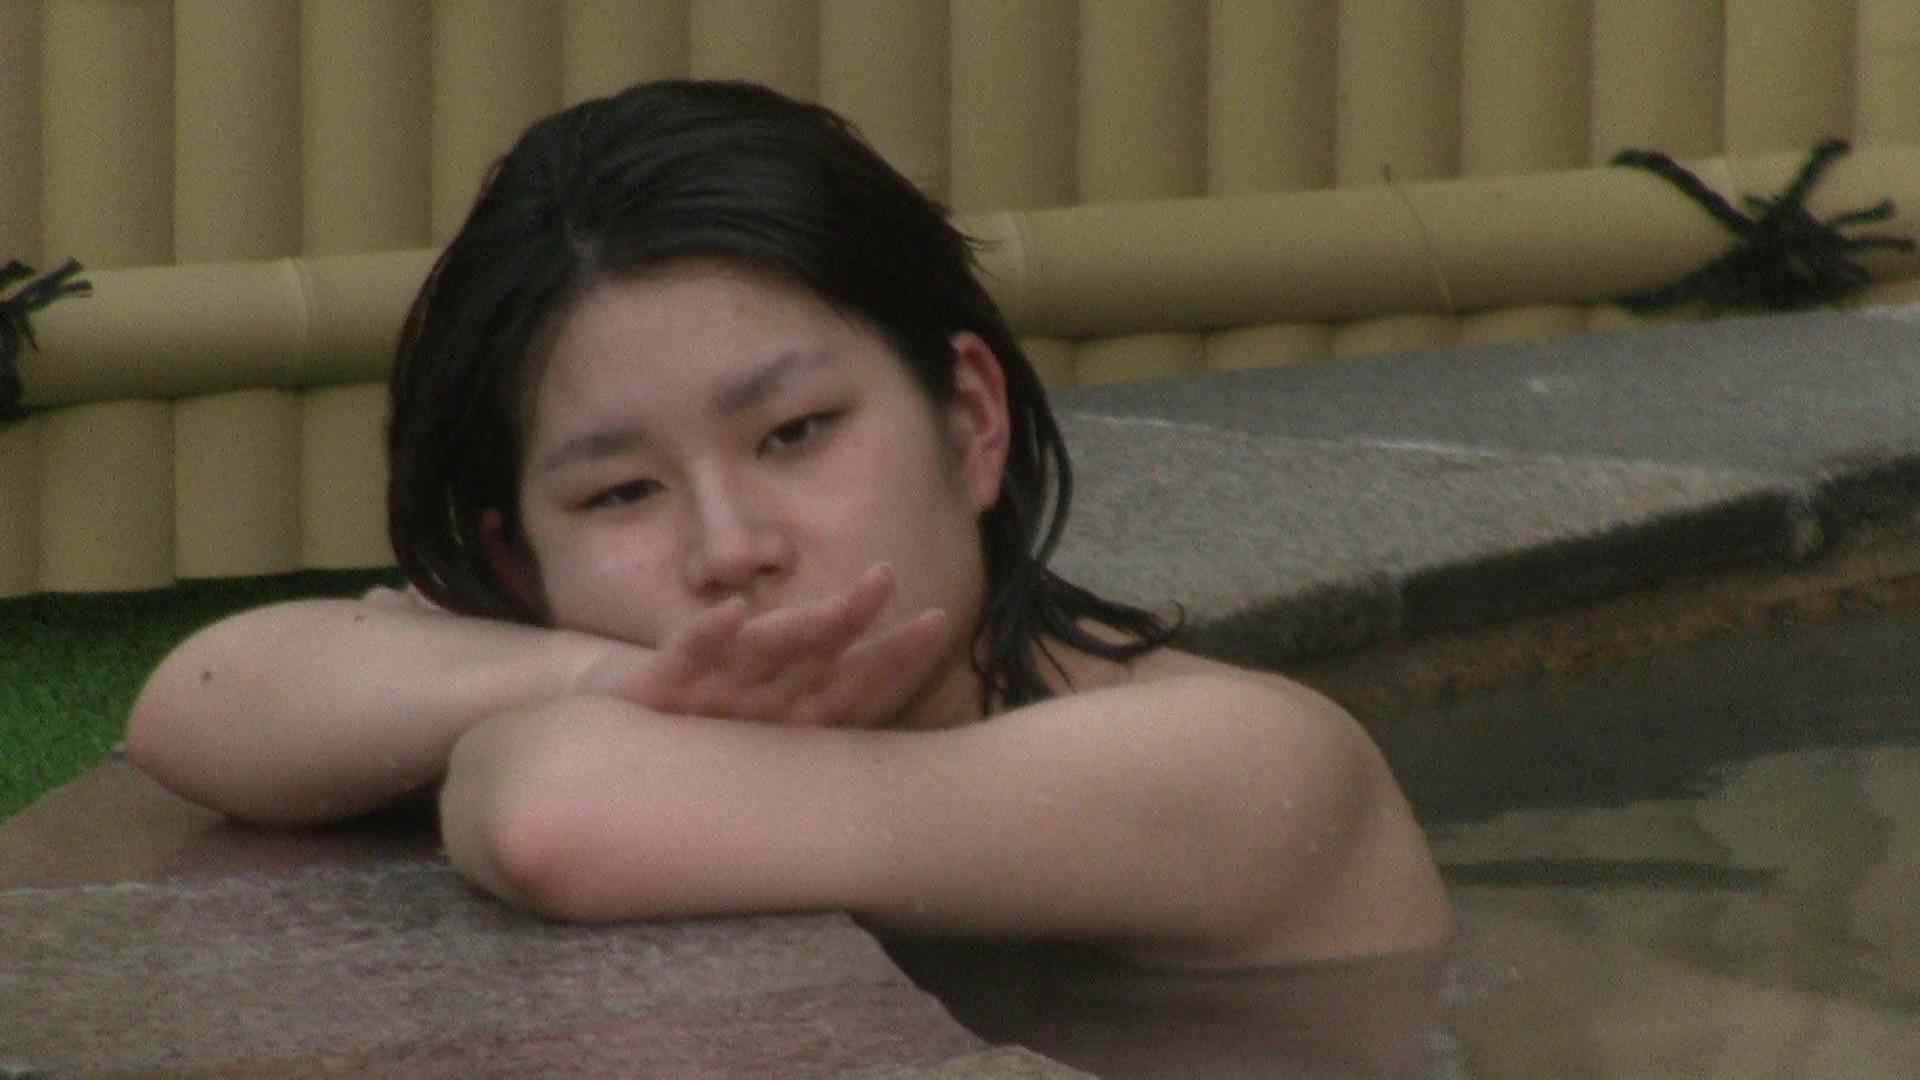 Aquaな露天風呂Vol.230 盗撮 | OLセックス  96画像 49